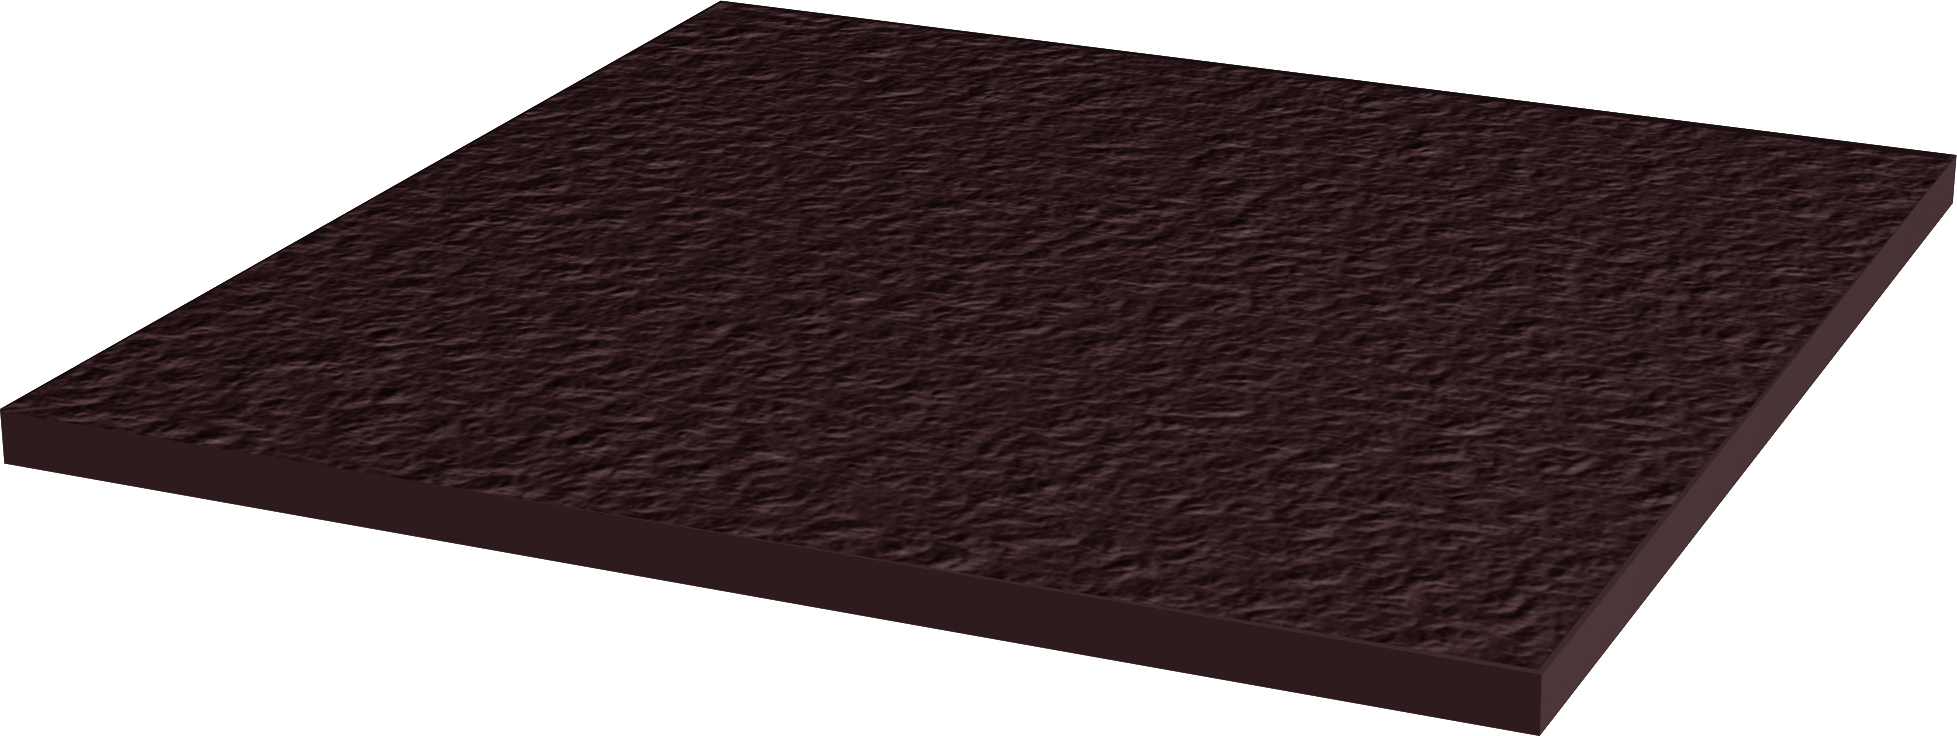 Natural Brown Duro Плитка базовая структ 30х30х1,1 ступень paradyz natural простая brown duro 30x30